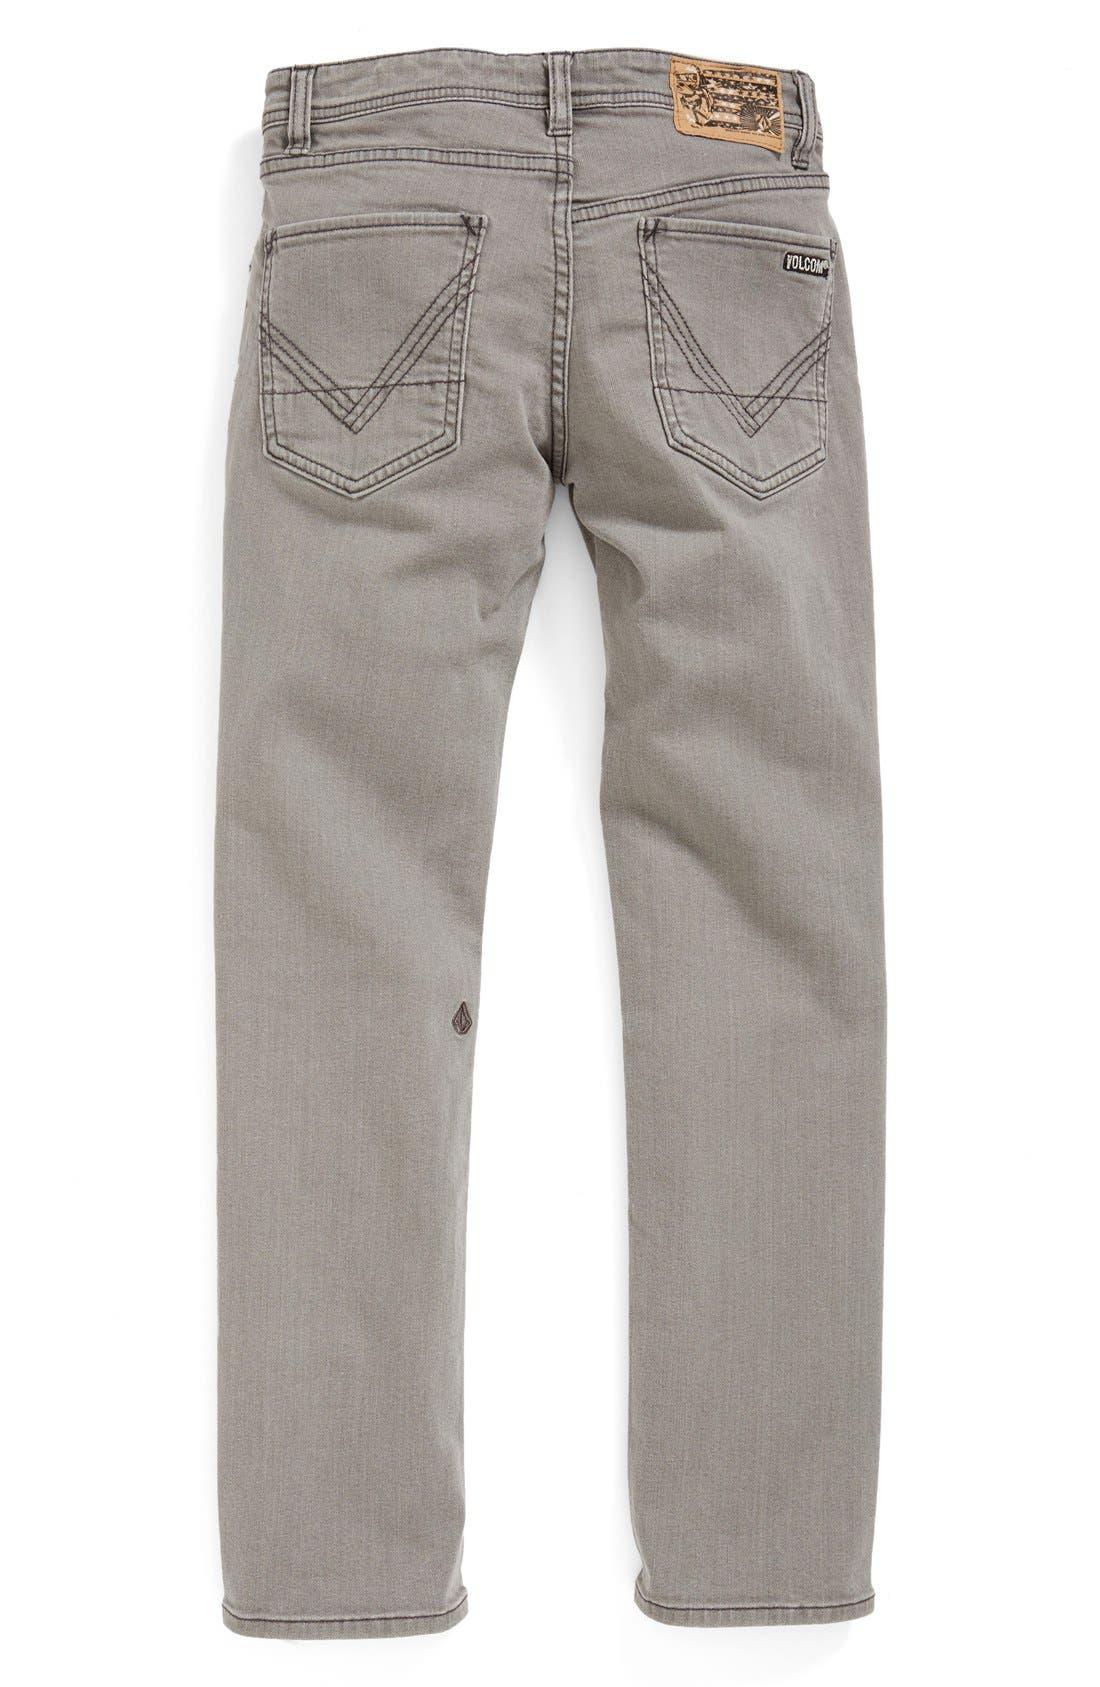 Main Image - Volcom 'Vorta' Slim Fit Jeans (Big Boys)